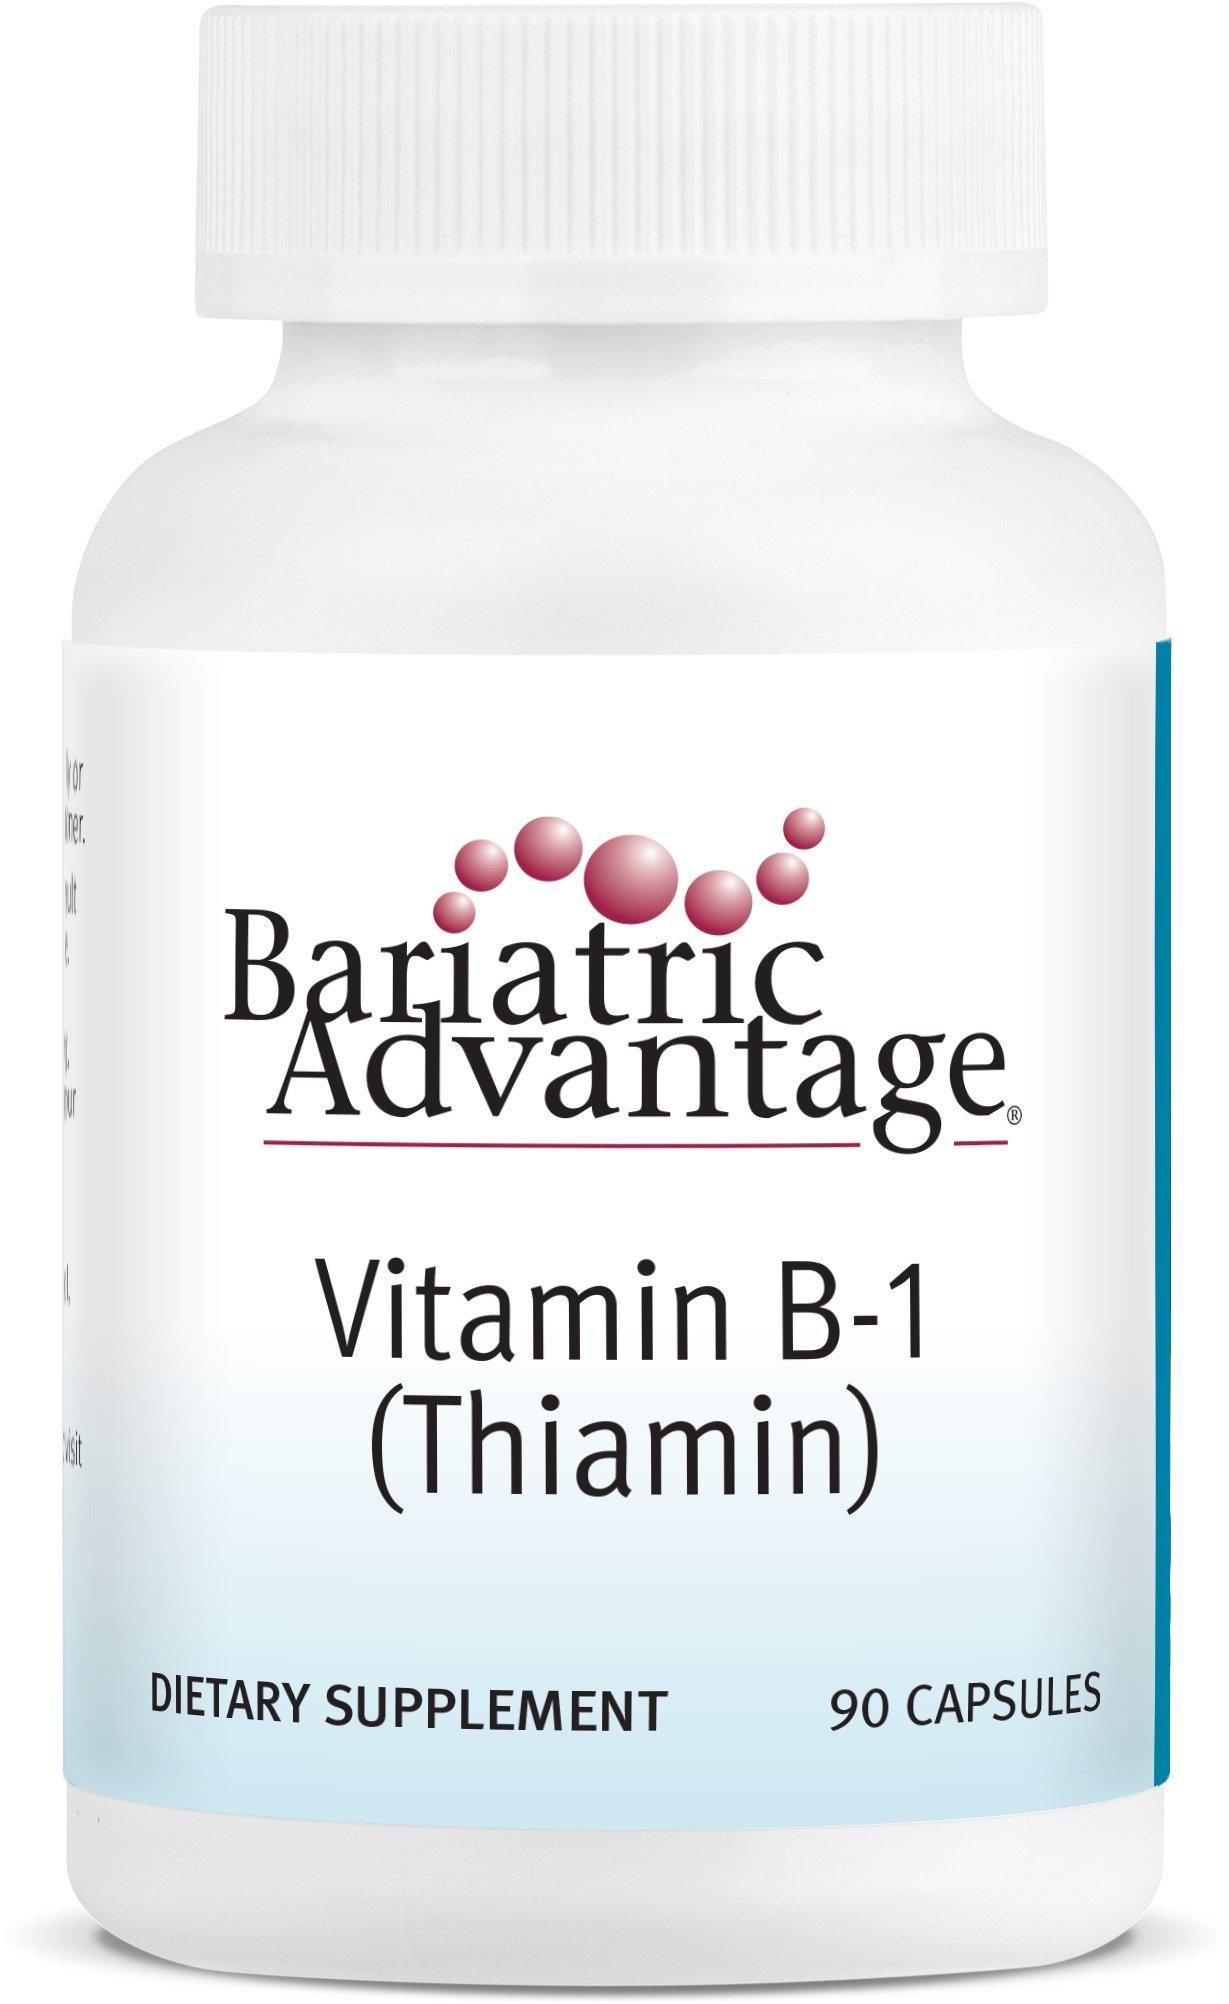 Bariatric Advantage - B-1 Thiamine Capsules, 90 Count